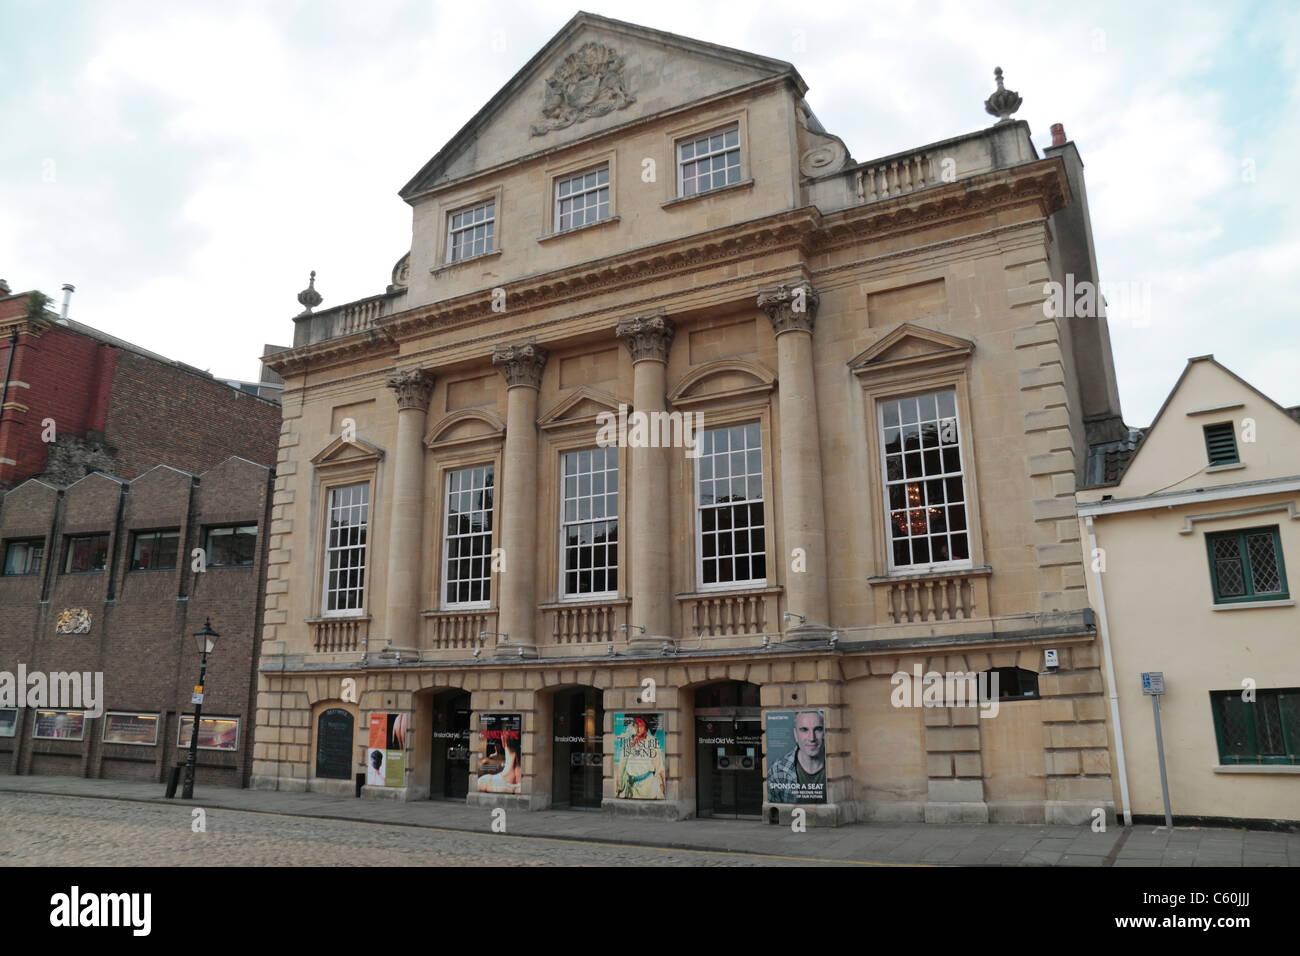 The Bristol Old Vic theatre in Bristol, UK. - Stock Image